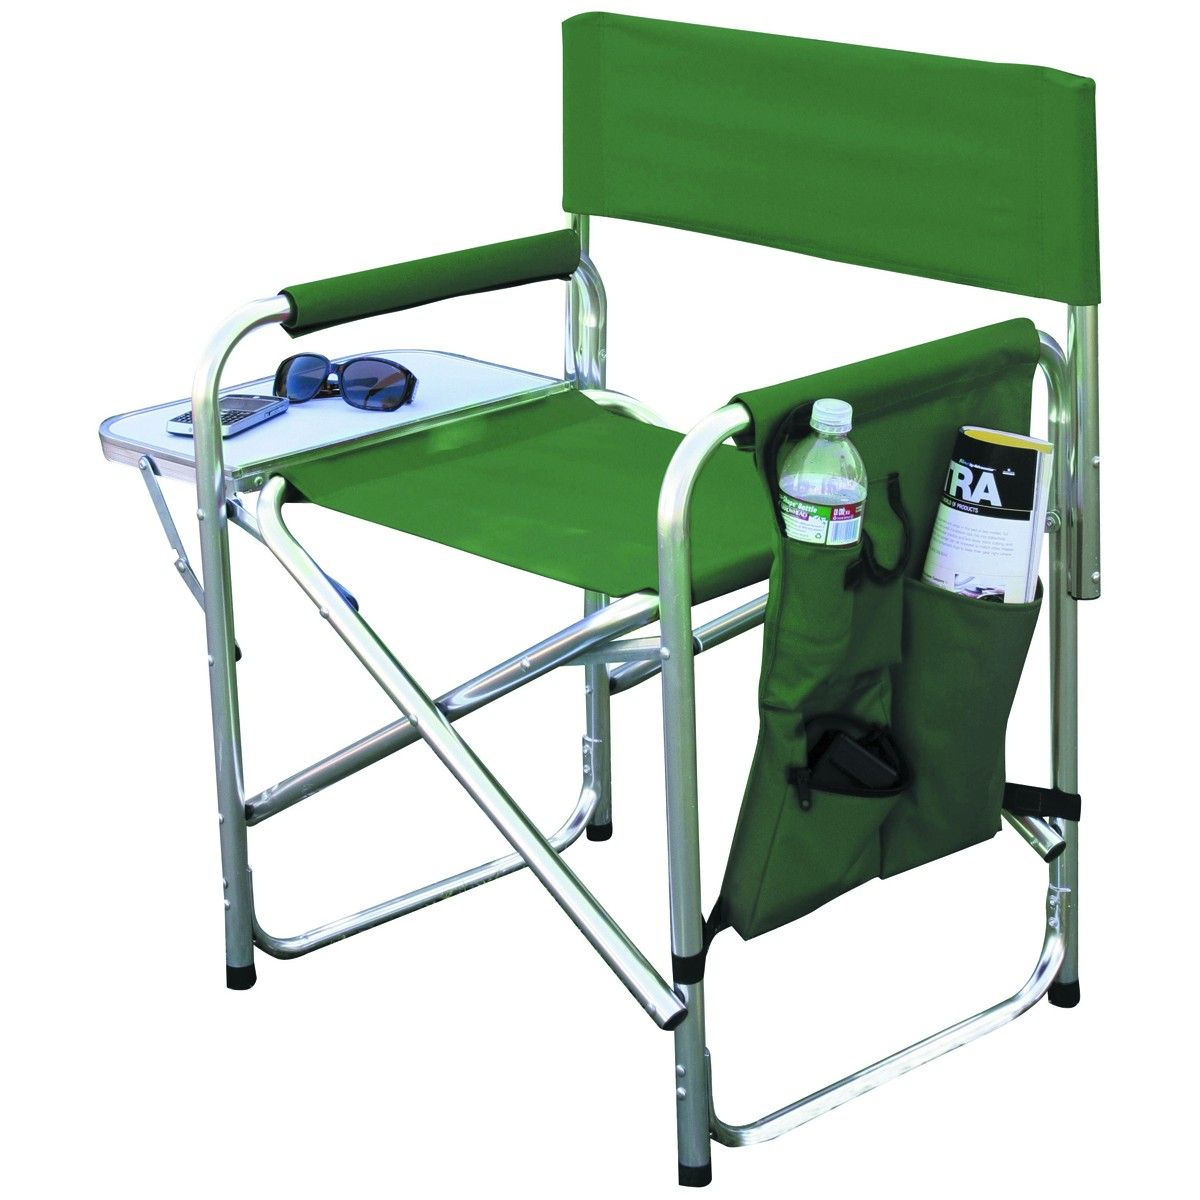 Folding Chair Rack Diy Plastic Wood Adirondack Plans 66383 Foldable Aluminum Sports Harbor Freight